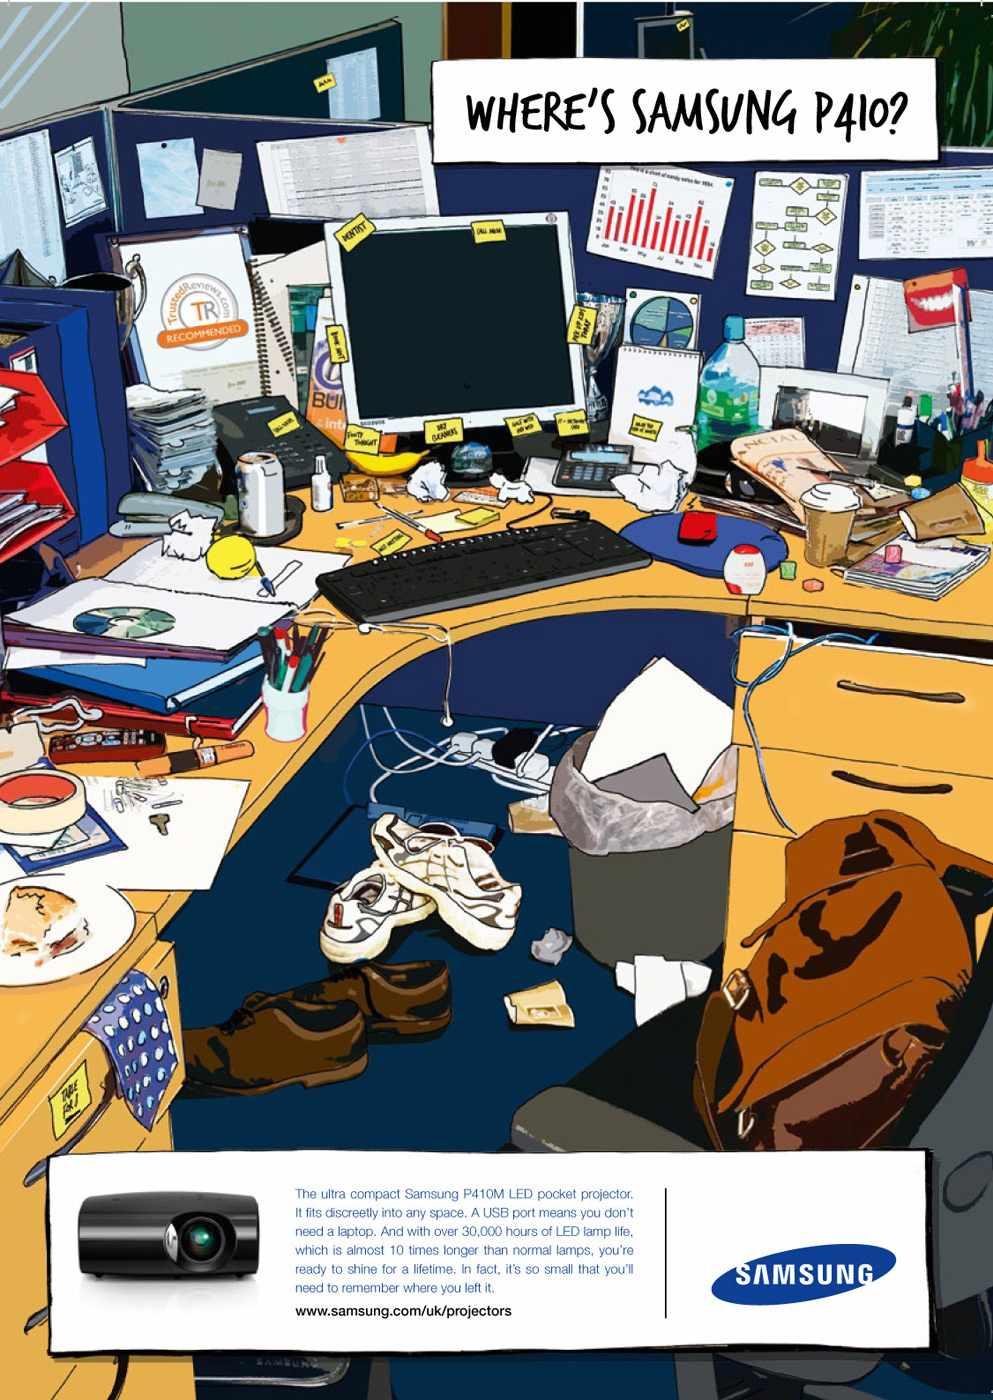 IT0039_P410_Wheres_Desk